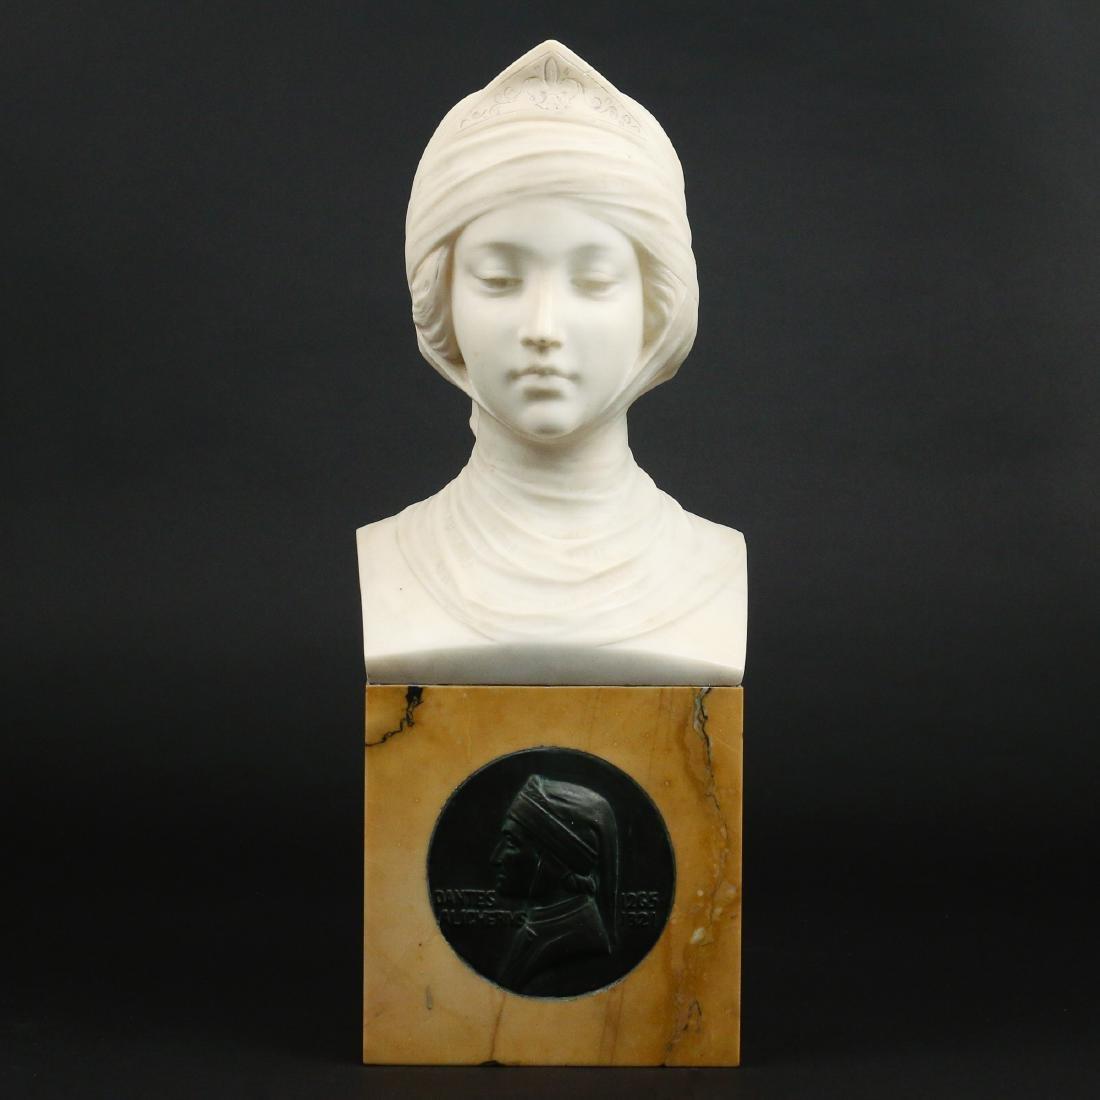 ANGIOLO MALAVOLTI (Italian, 1876-1947)